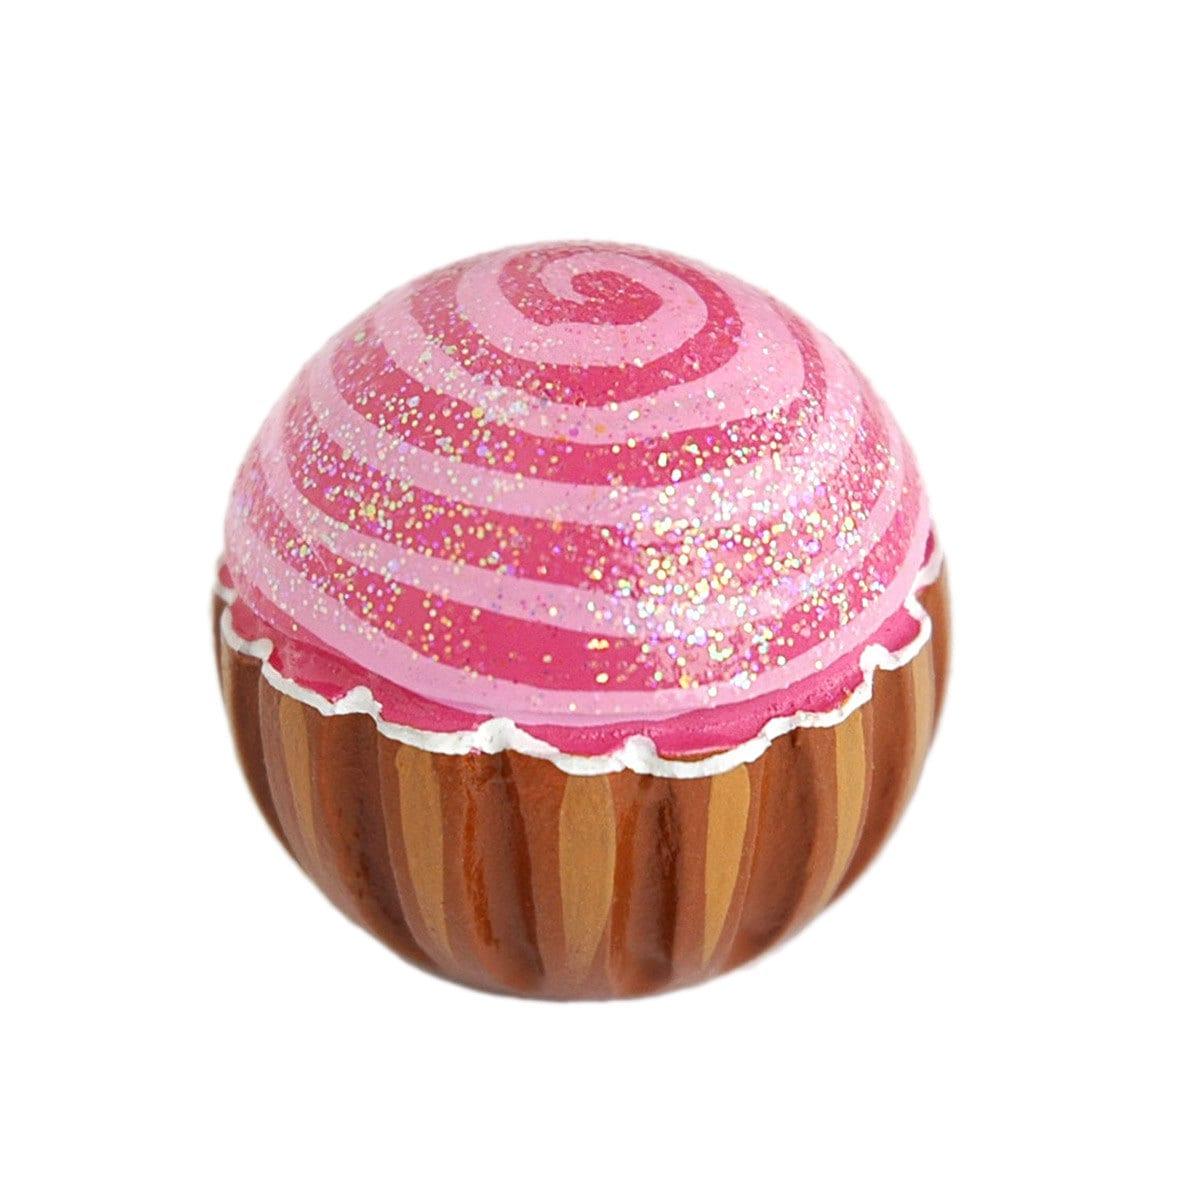 Cupcake Knob